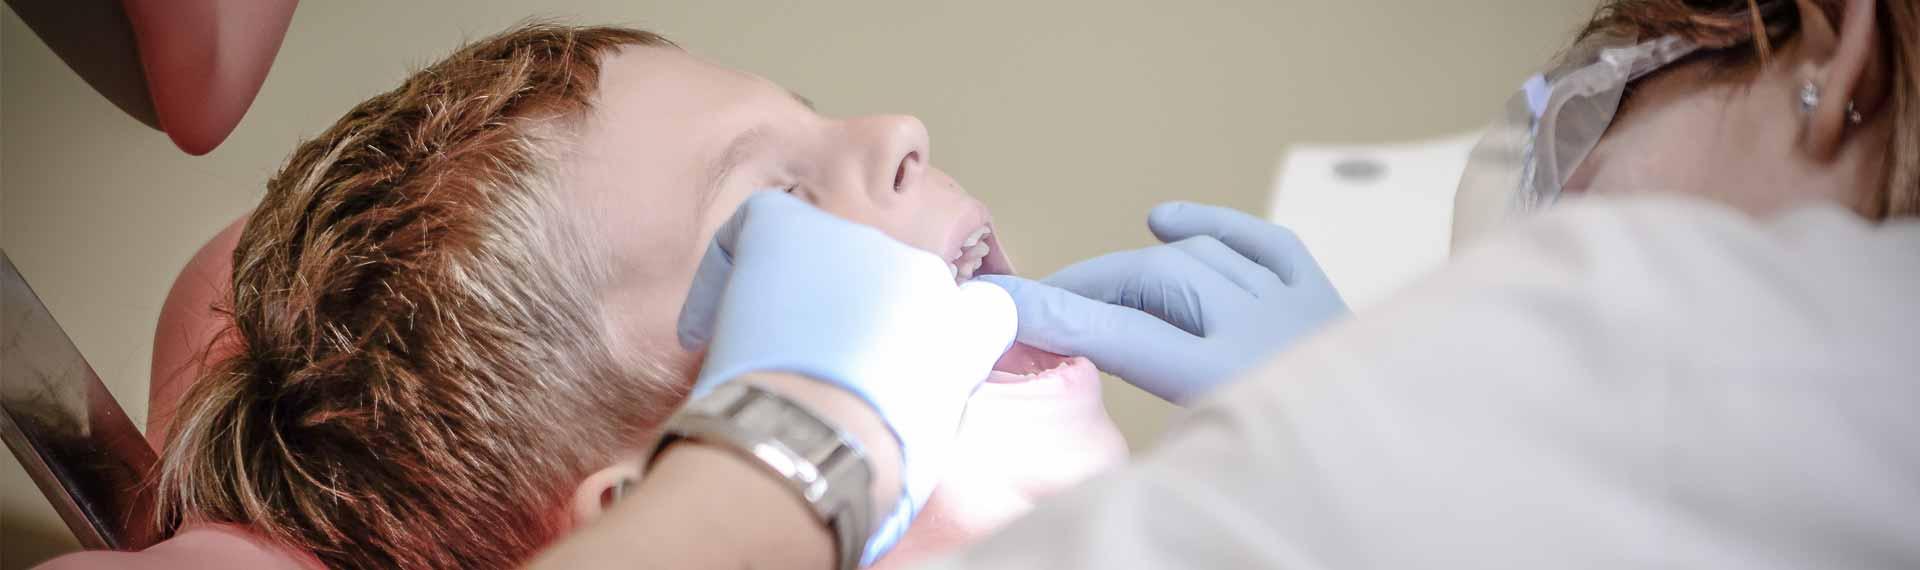 melville-dental-clinique-dentaire